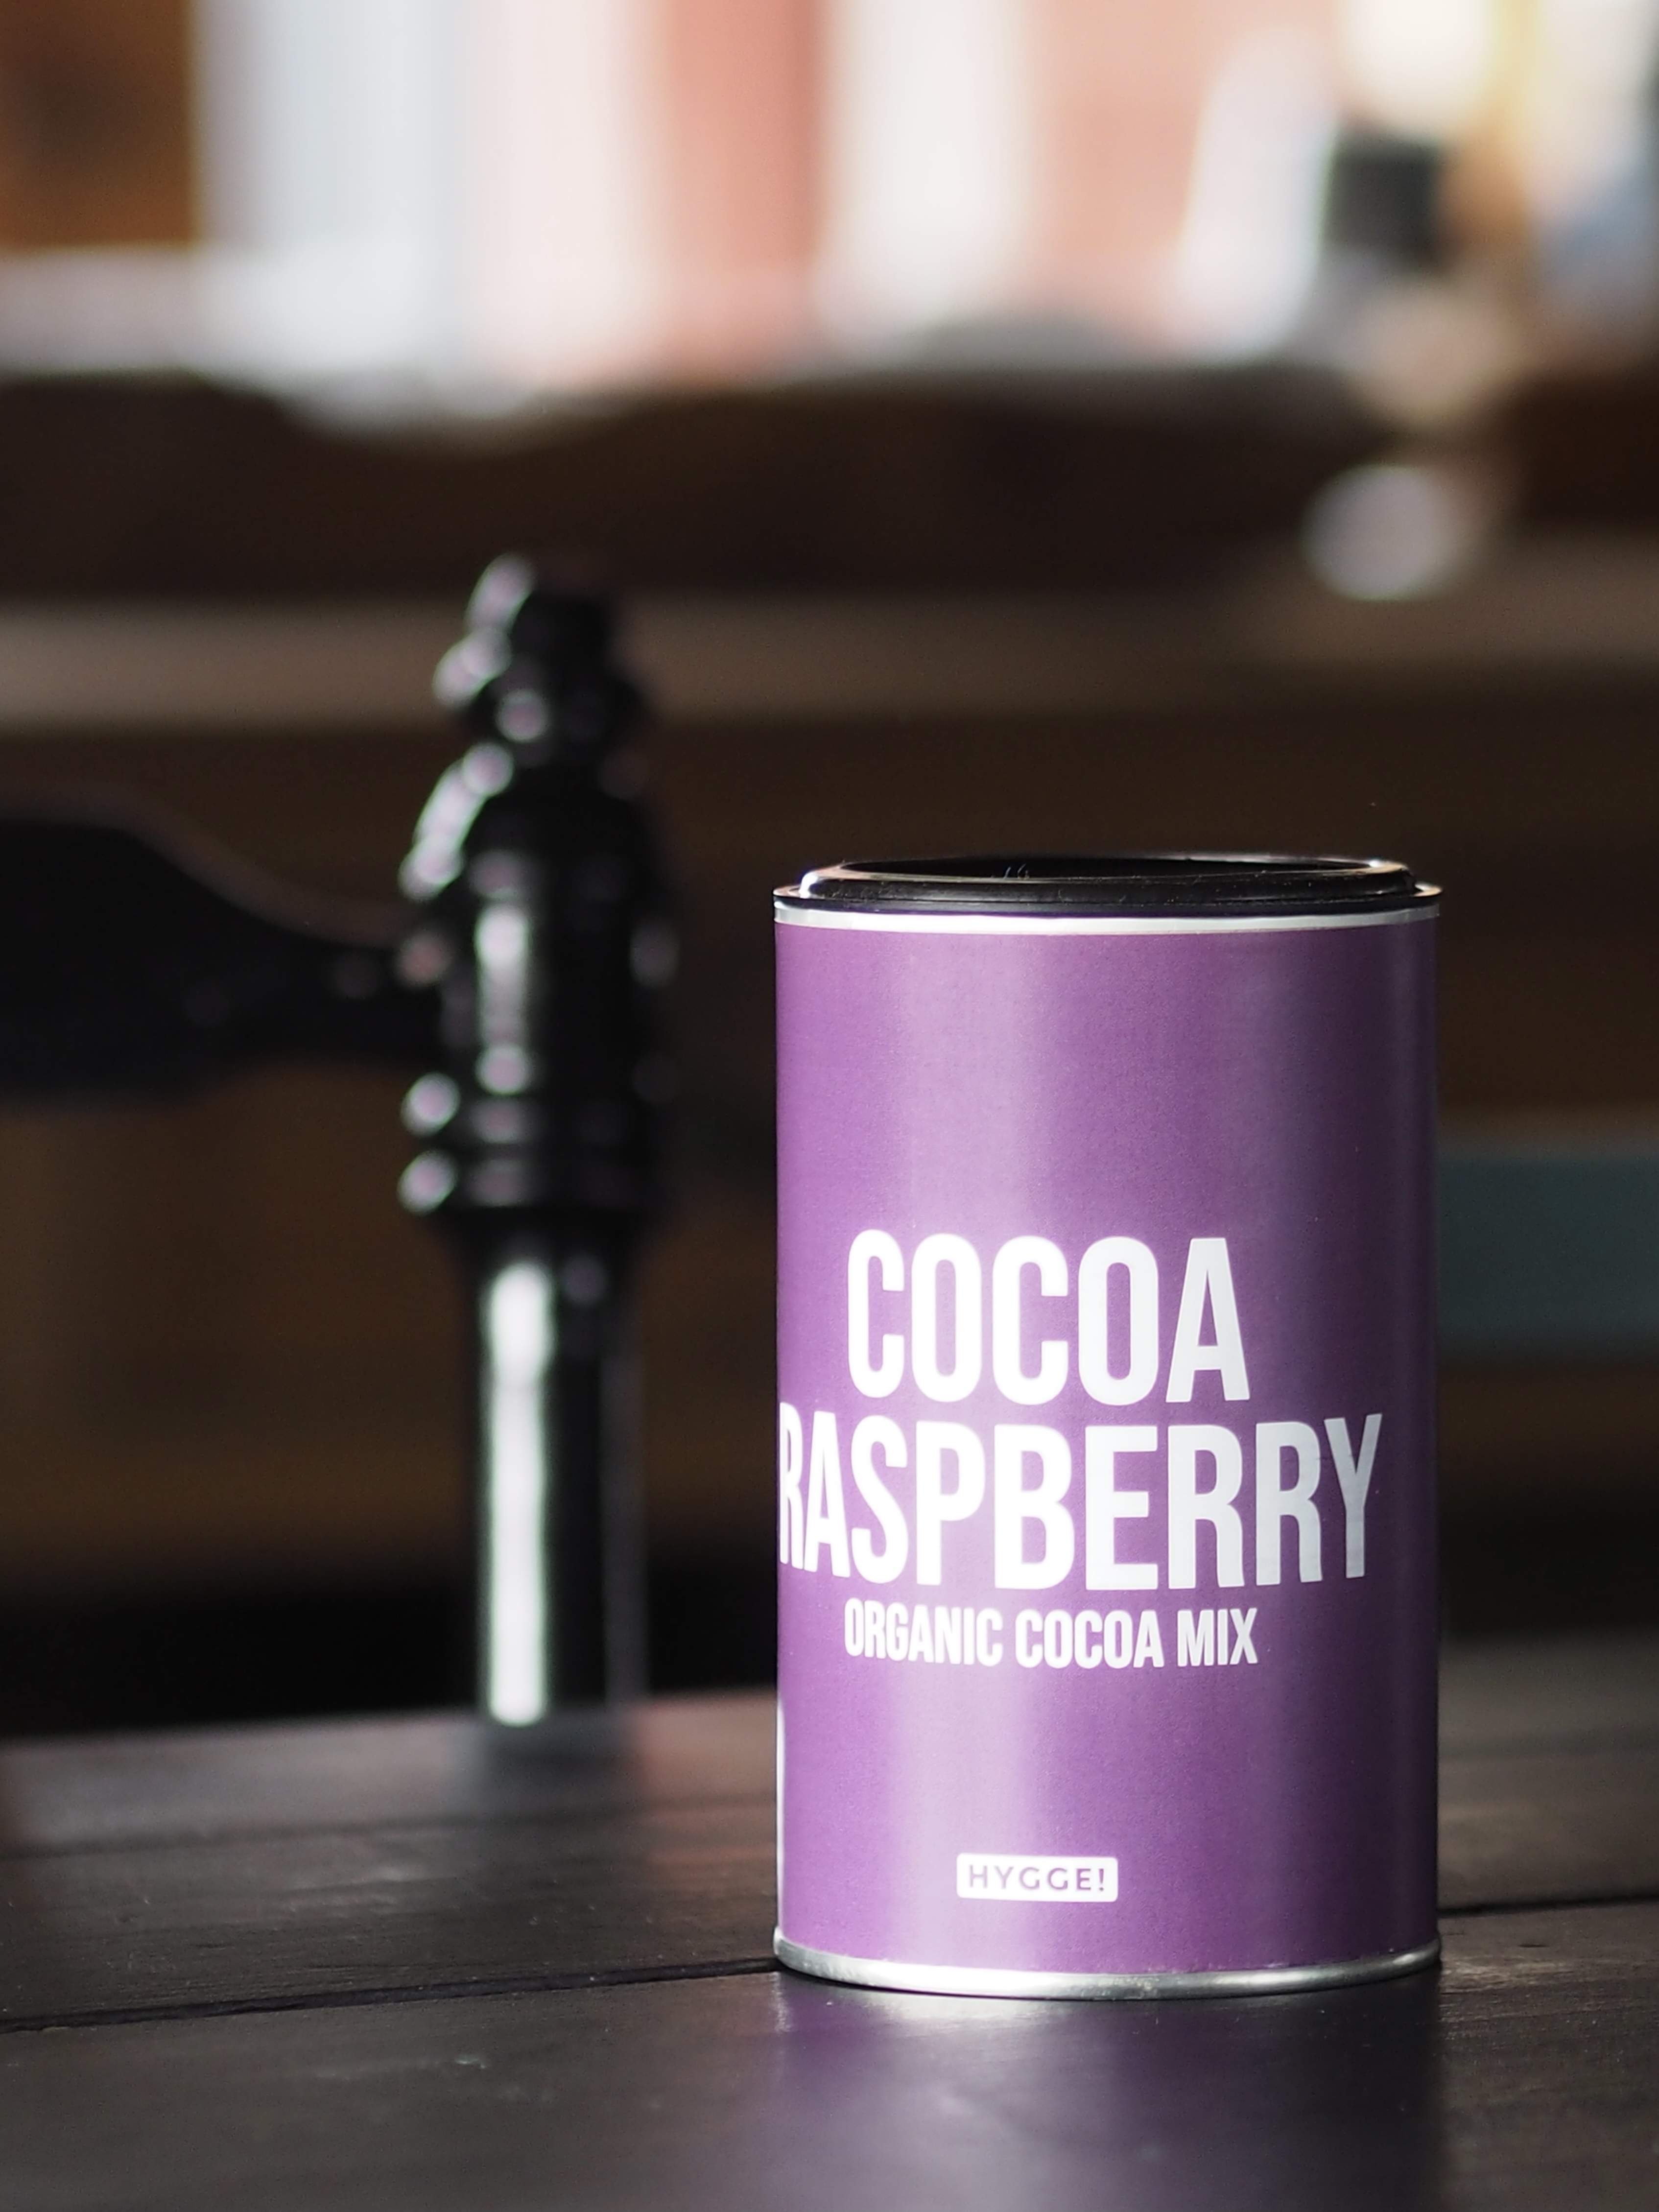 Cocoa Raspberry, HYGGE!